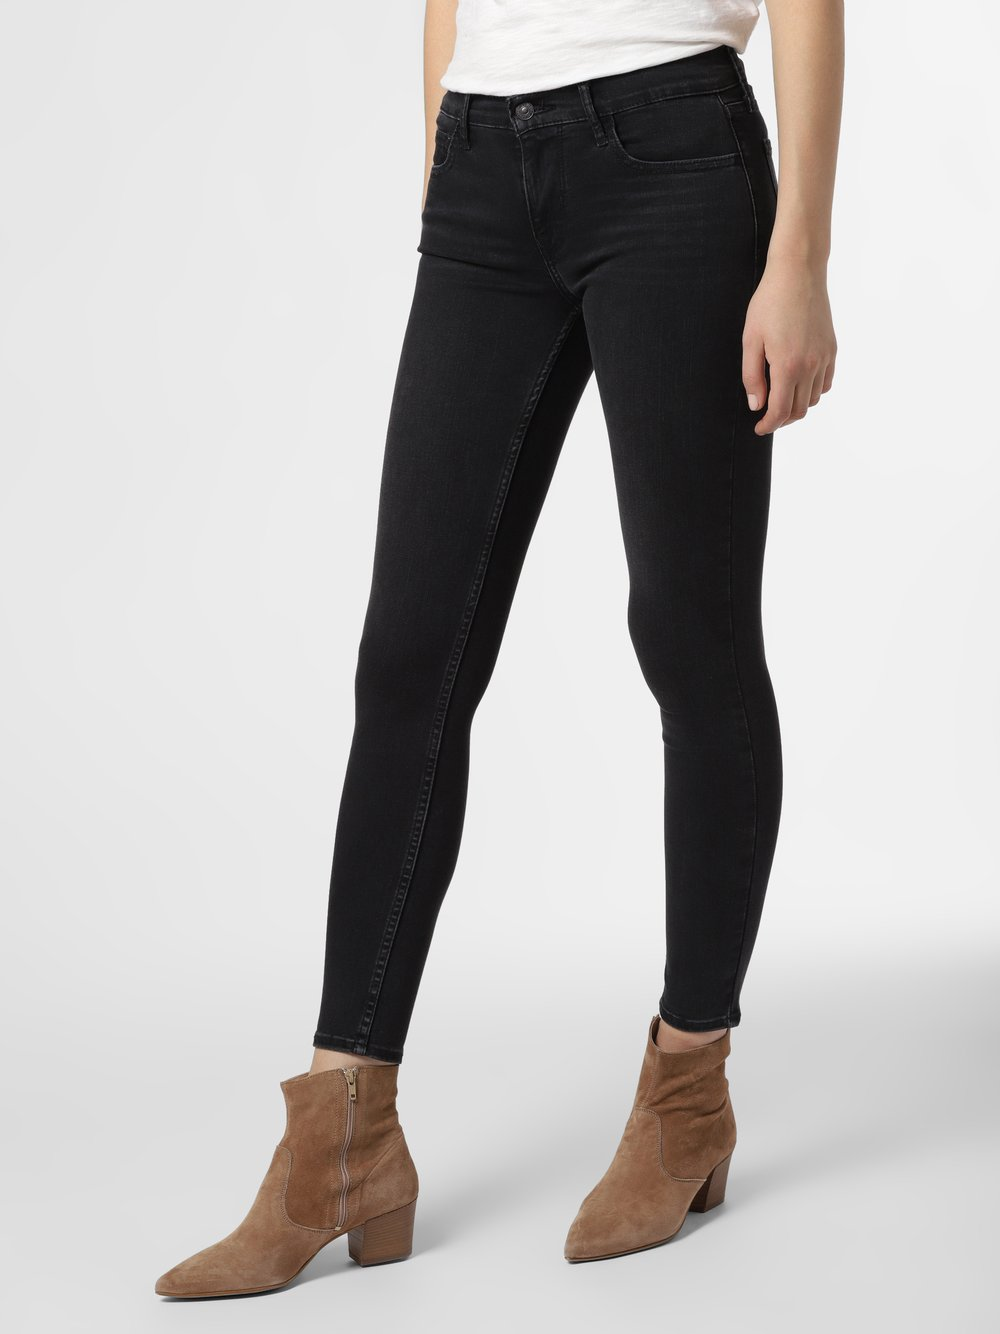 Levi's - Jeansy damskie – 710™ Super Skinny, szary